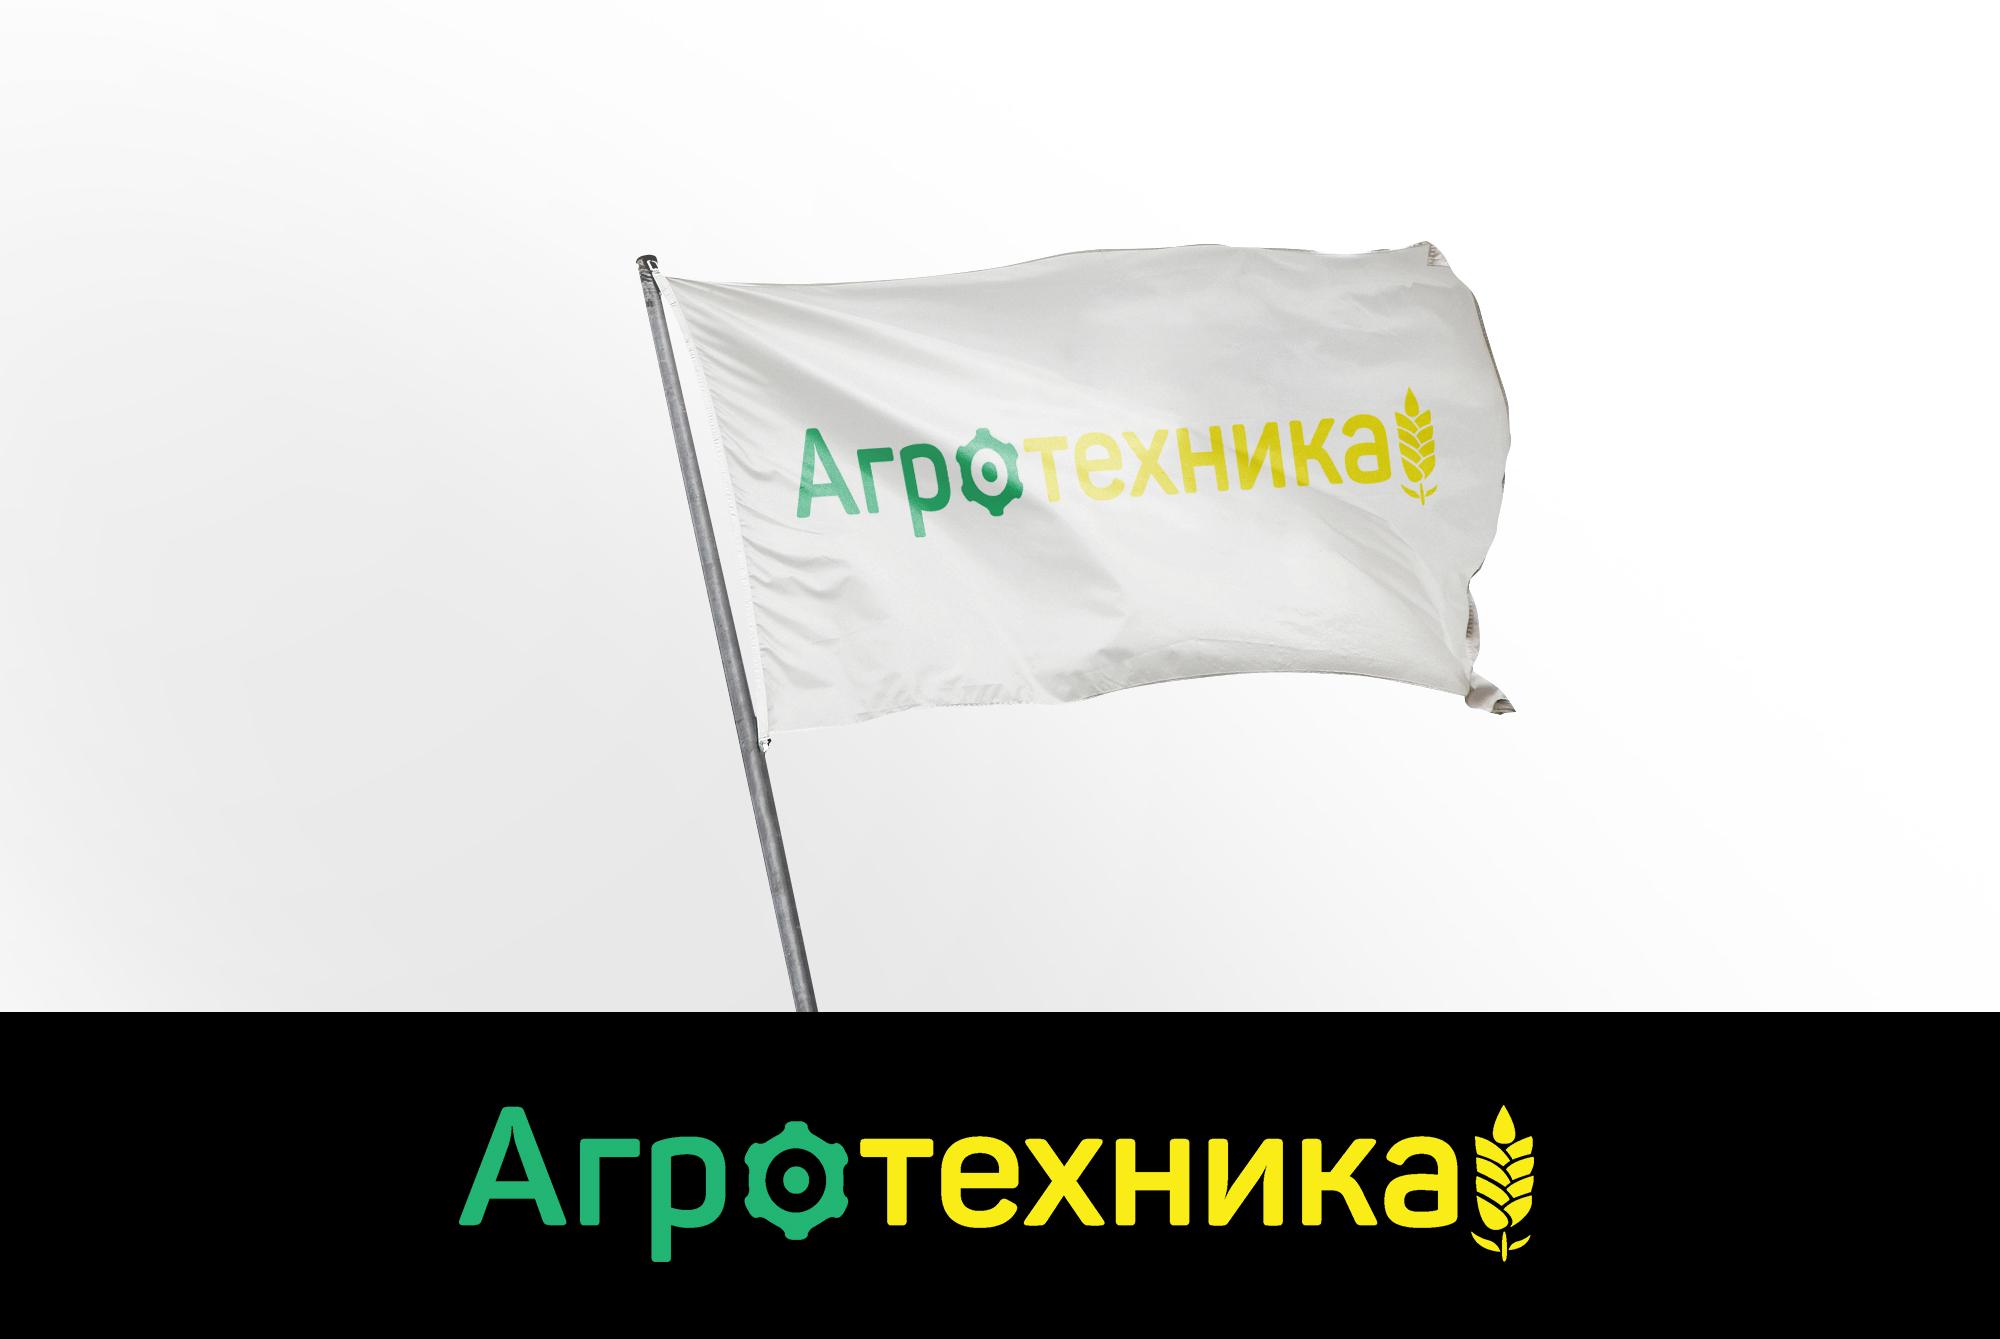 Разработка логотипа для компании Агротехника фото f_2305c011daa0aaef.jpg